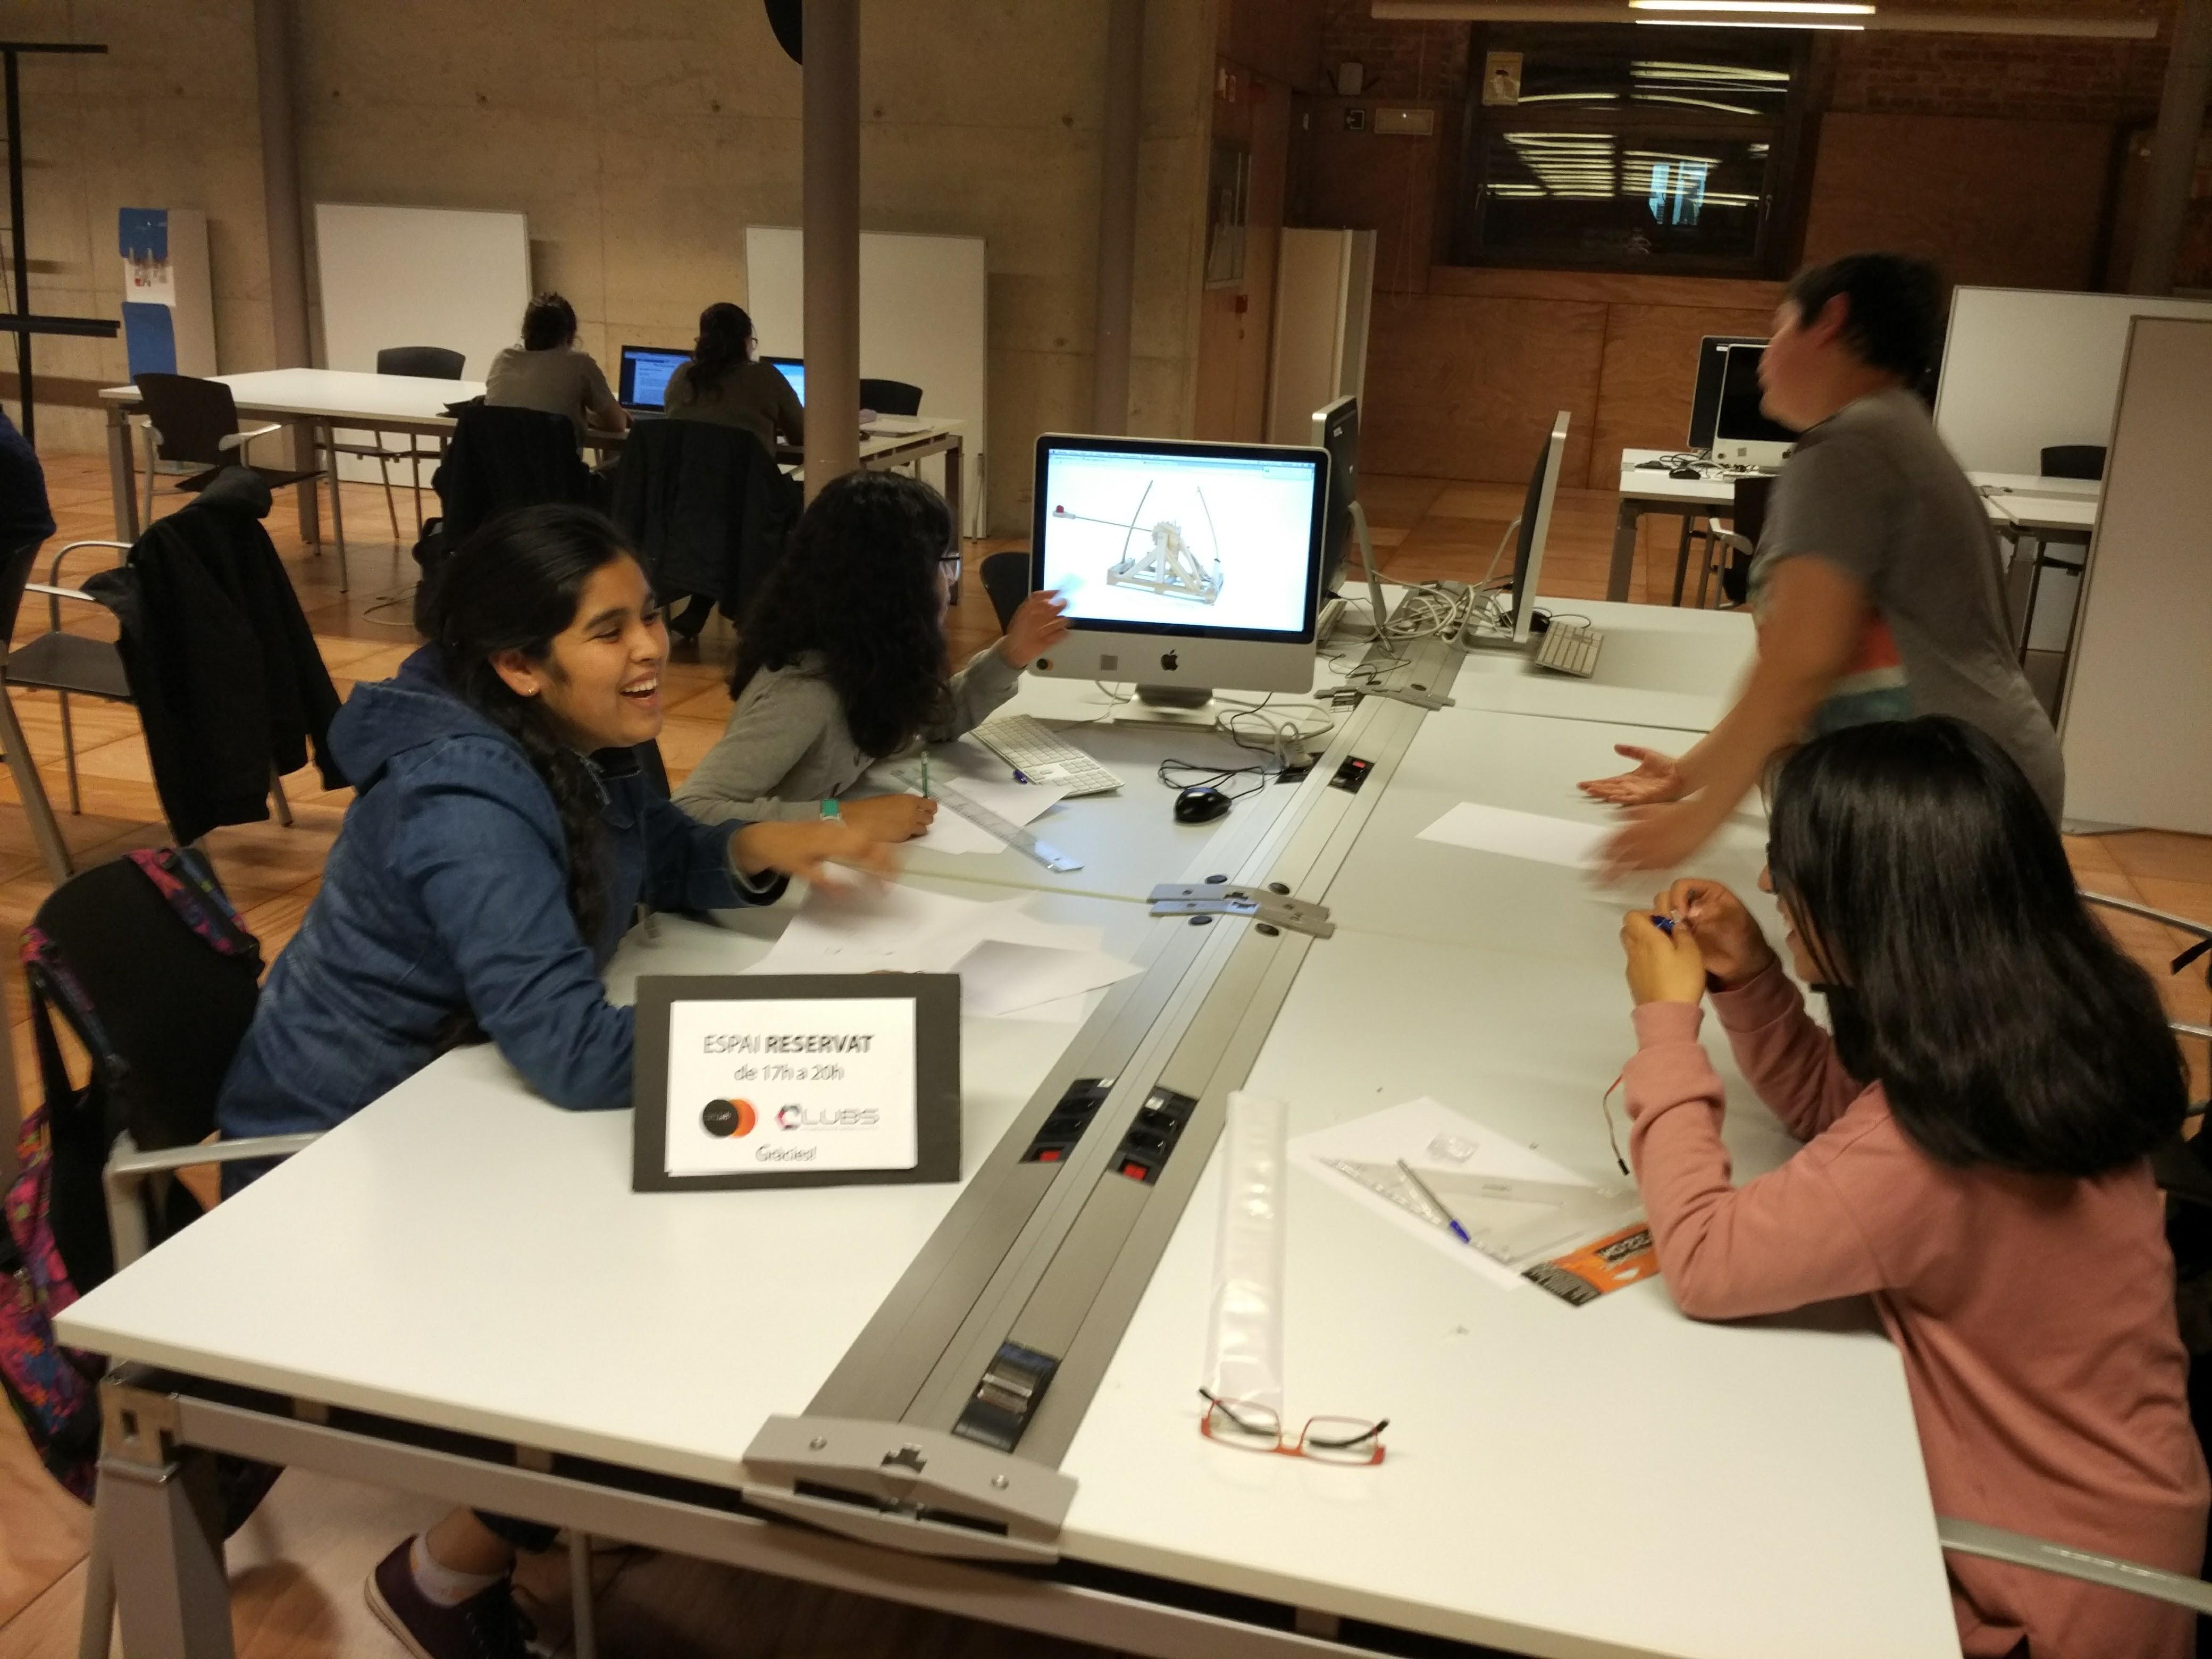 Nens al projecte Edulab